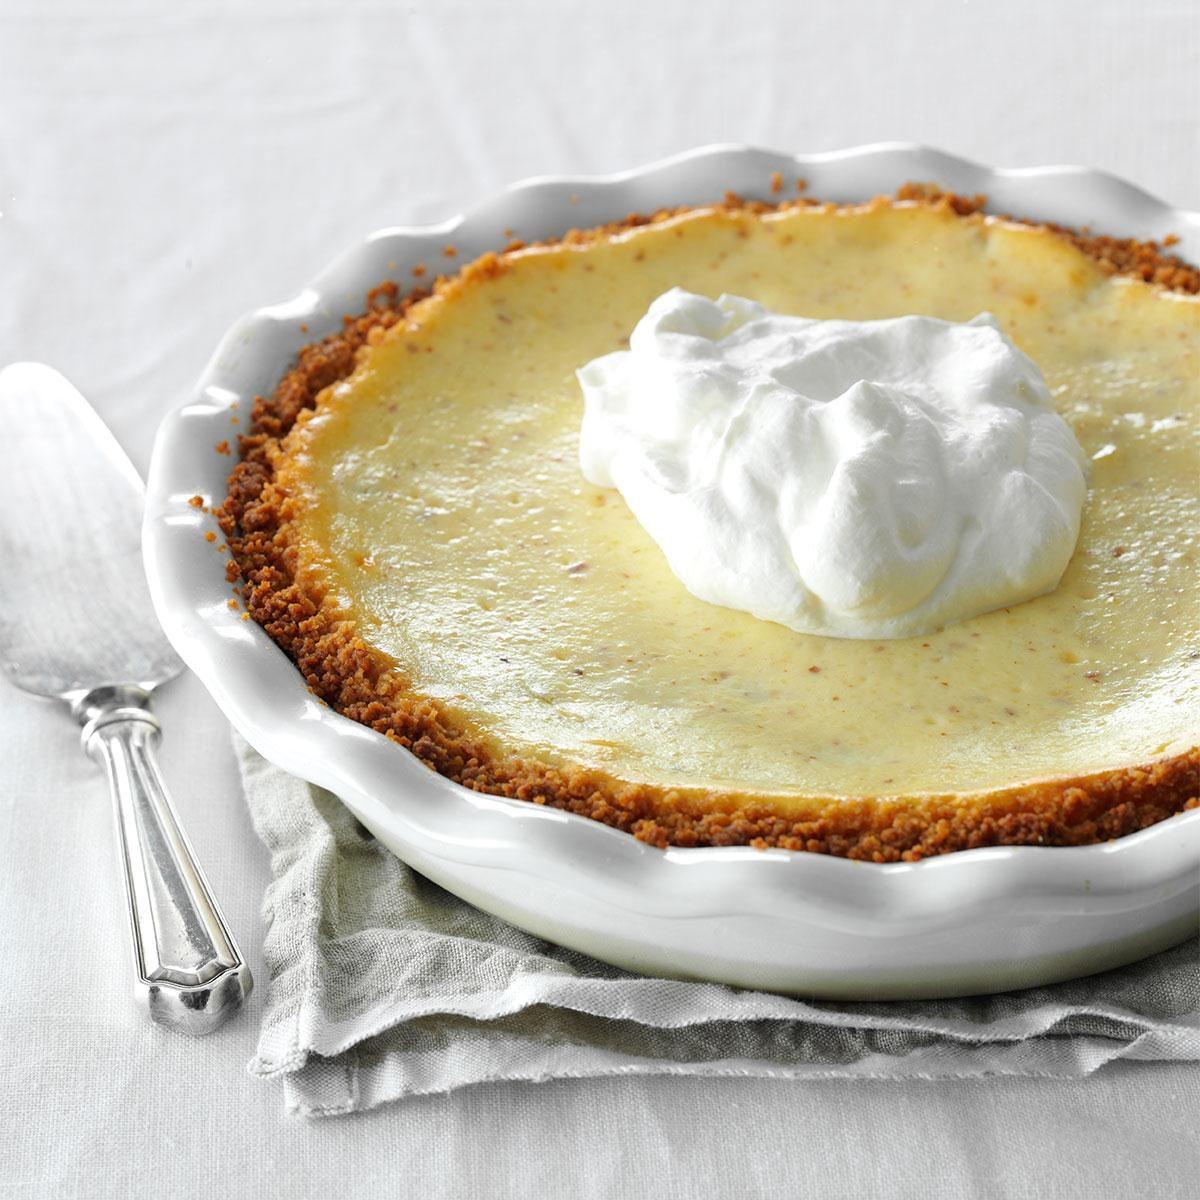 Hawaii: Pineapple Pie with Coconut Cream